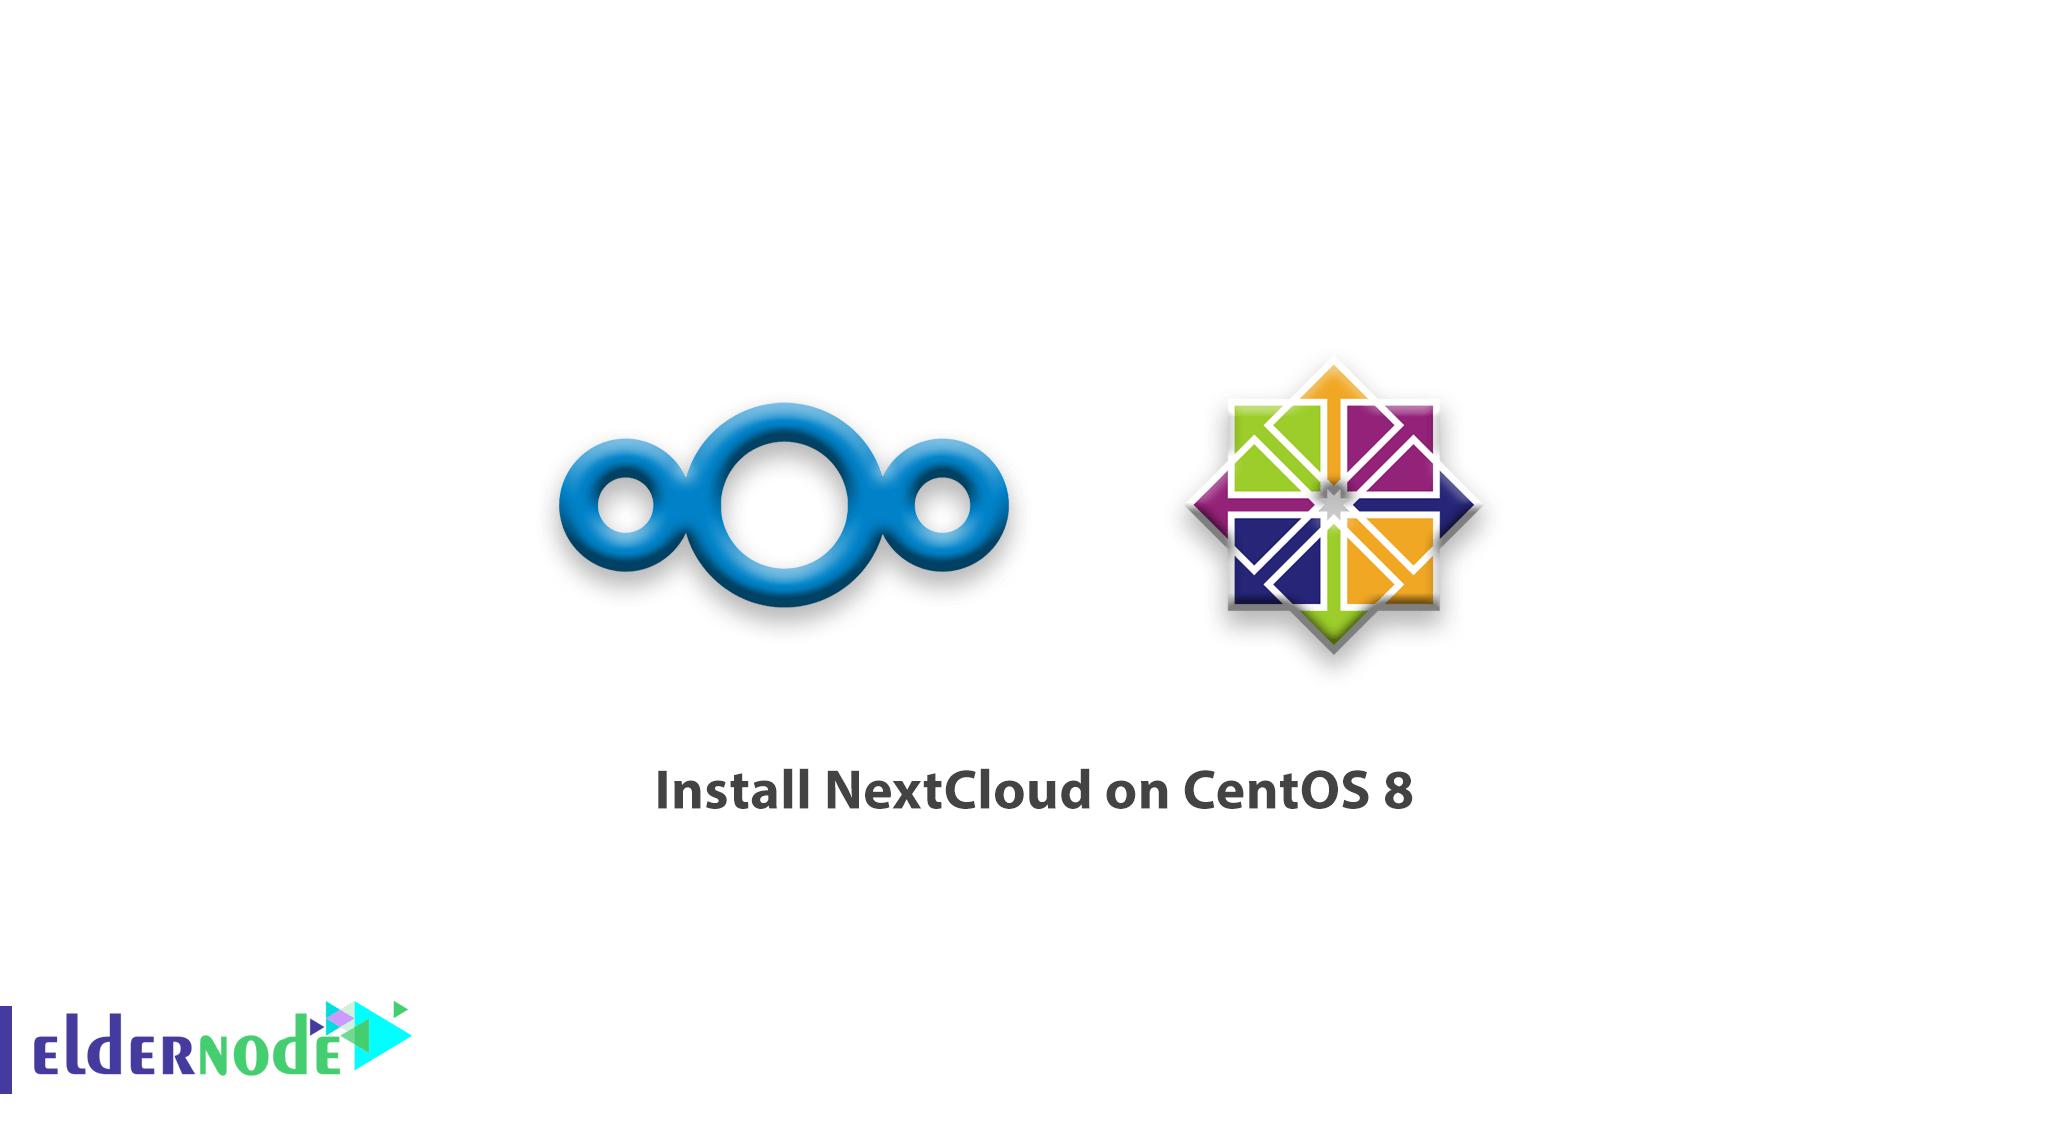 How to install NextCloud on CentOS 8